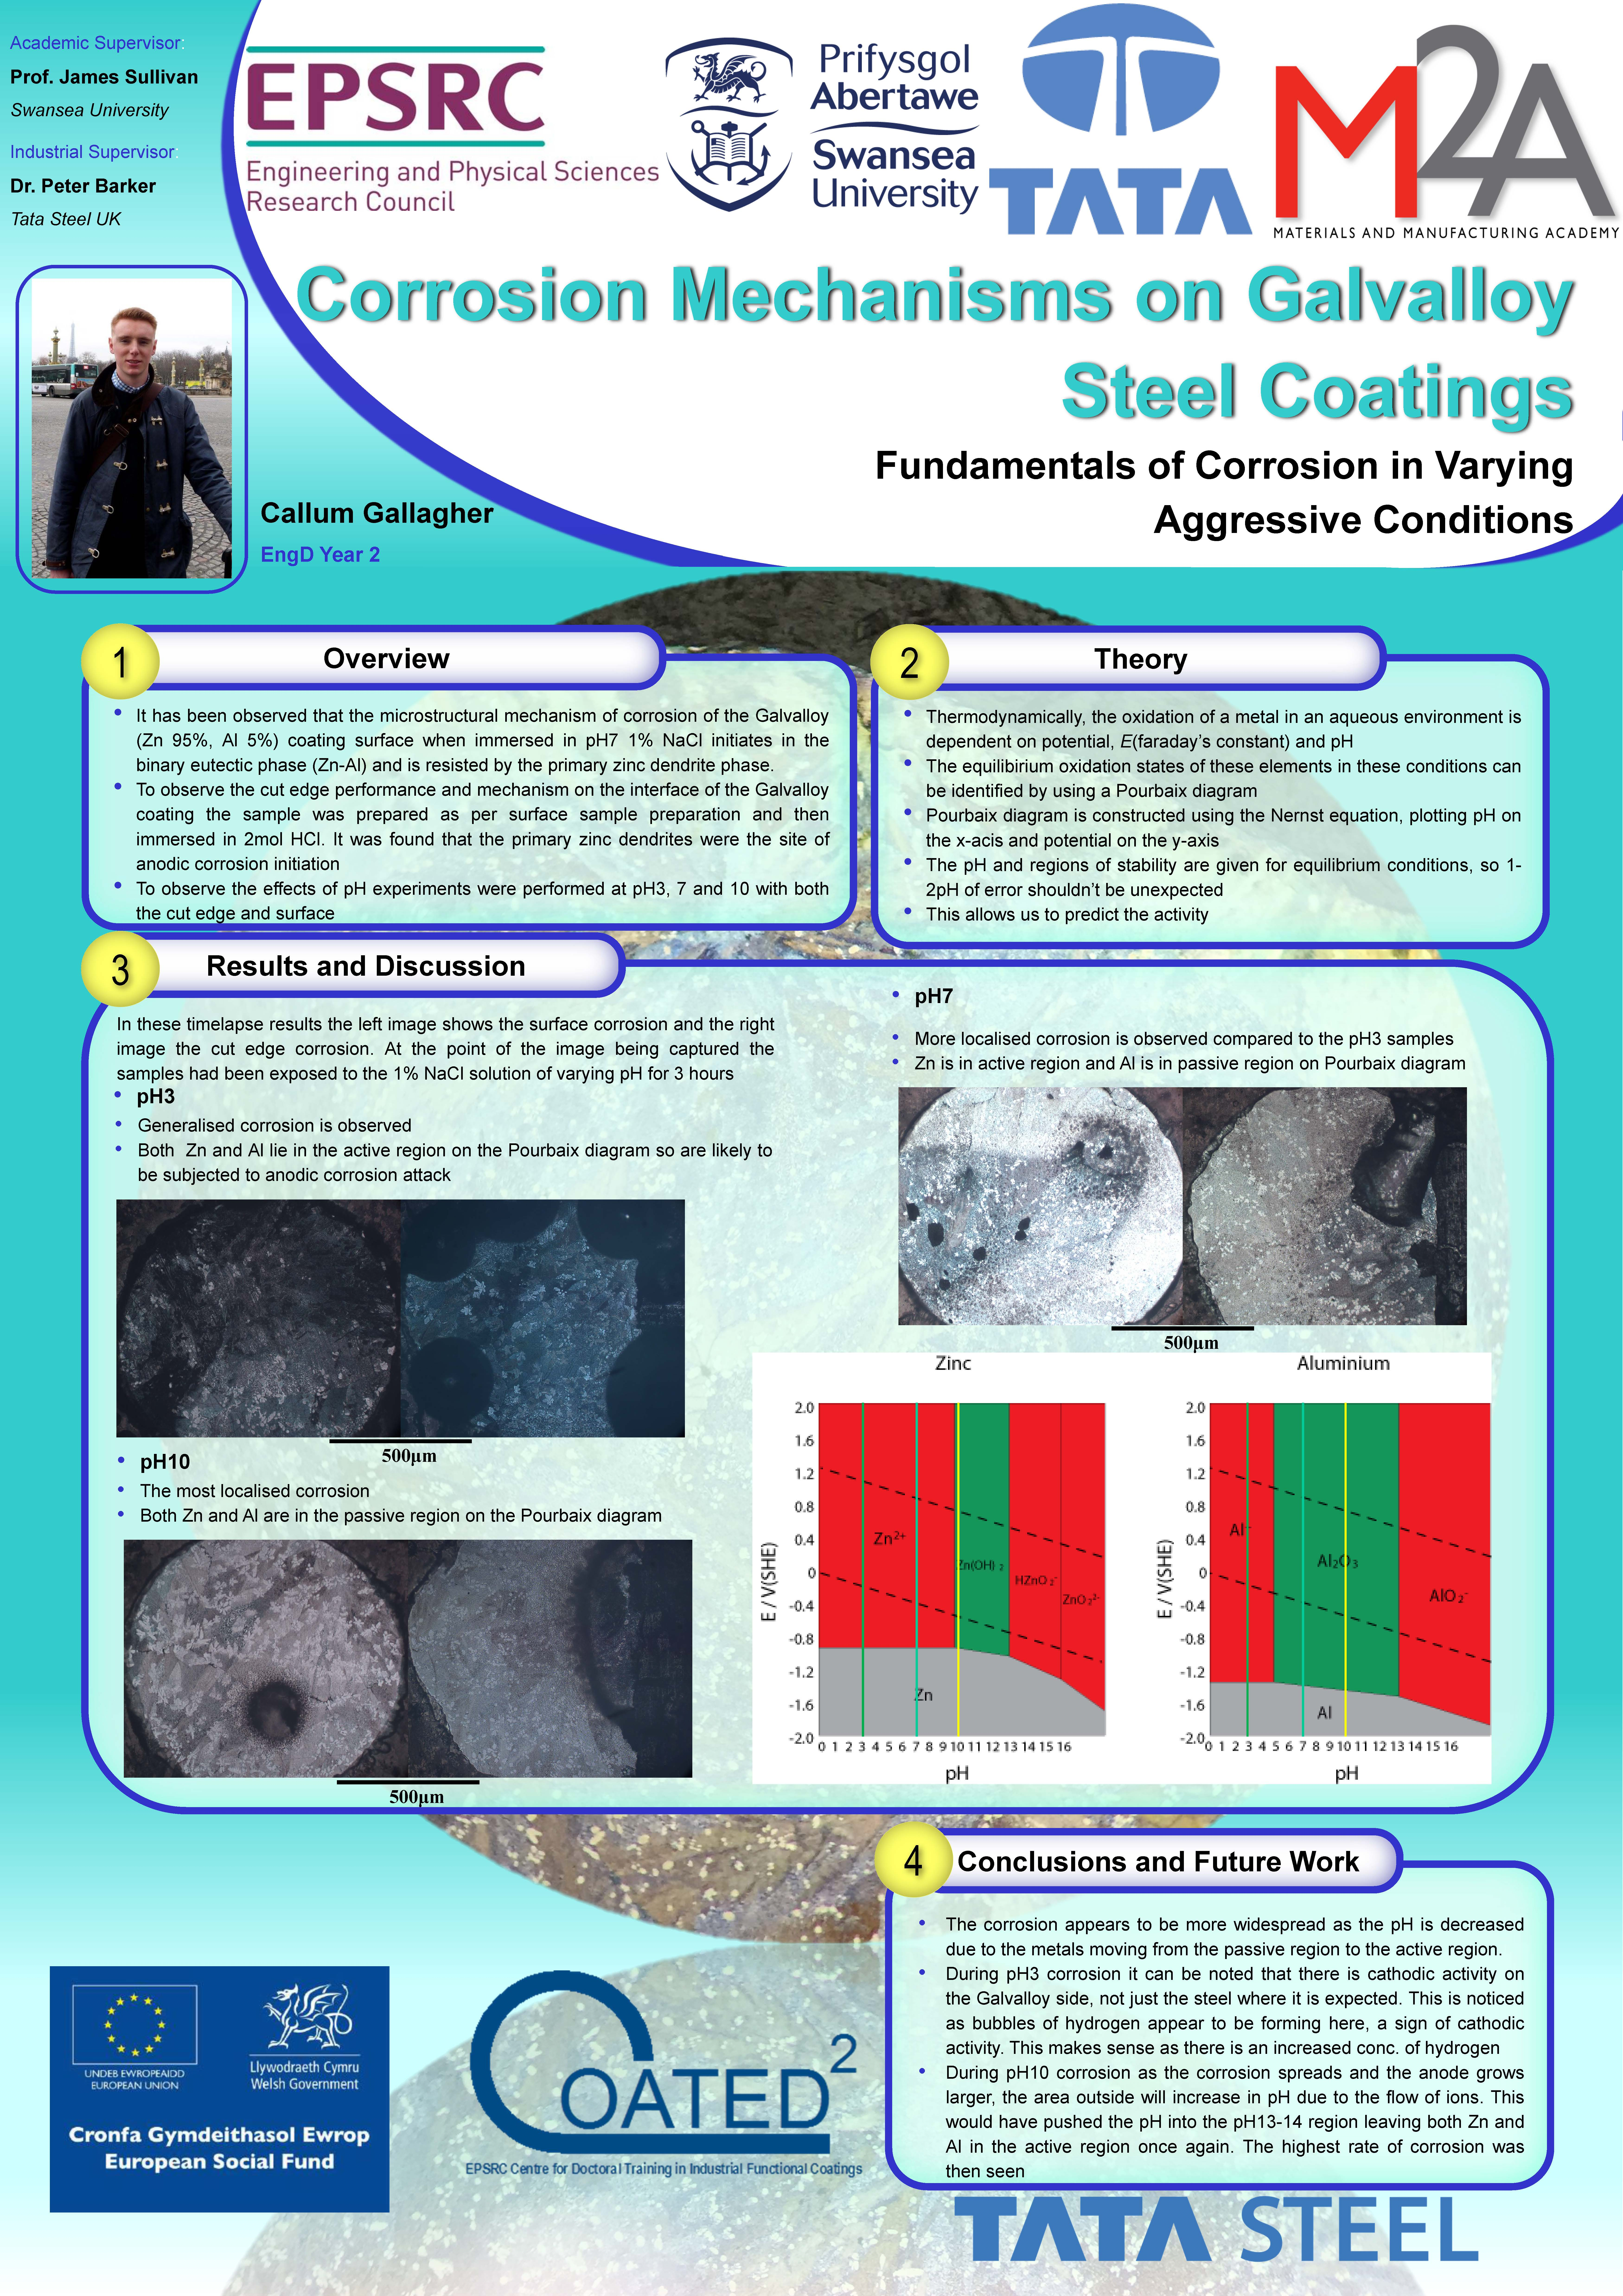 Corrosion Mechanisms on Galvalloy Steel Coatings